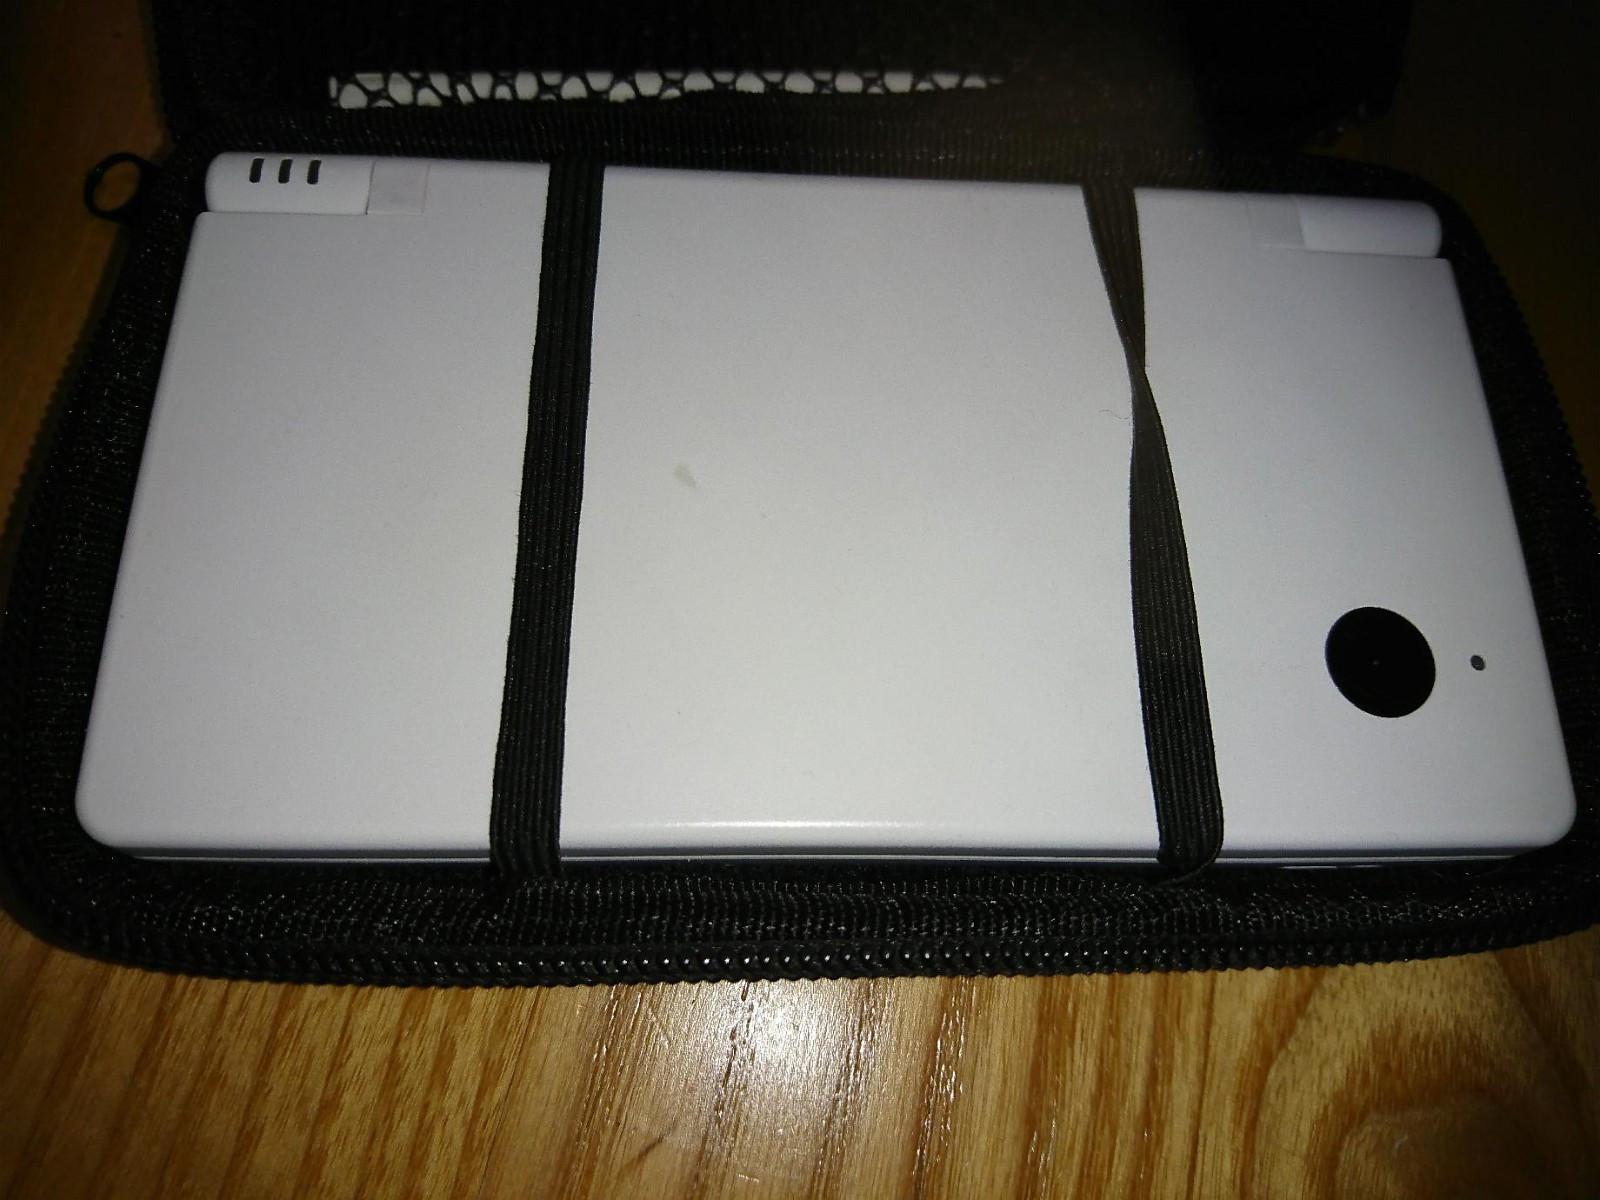 Nintendo 3DS, Nintendo DSi, og 12 spill - Finstadjordet  - Nintendo 3DS med minnekort selges 400kr Nintendo DSi med minnekort selges 200kr.  Spill selges 50-200kr stk. - Finstadjordet